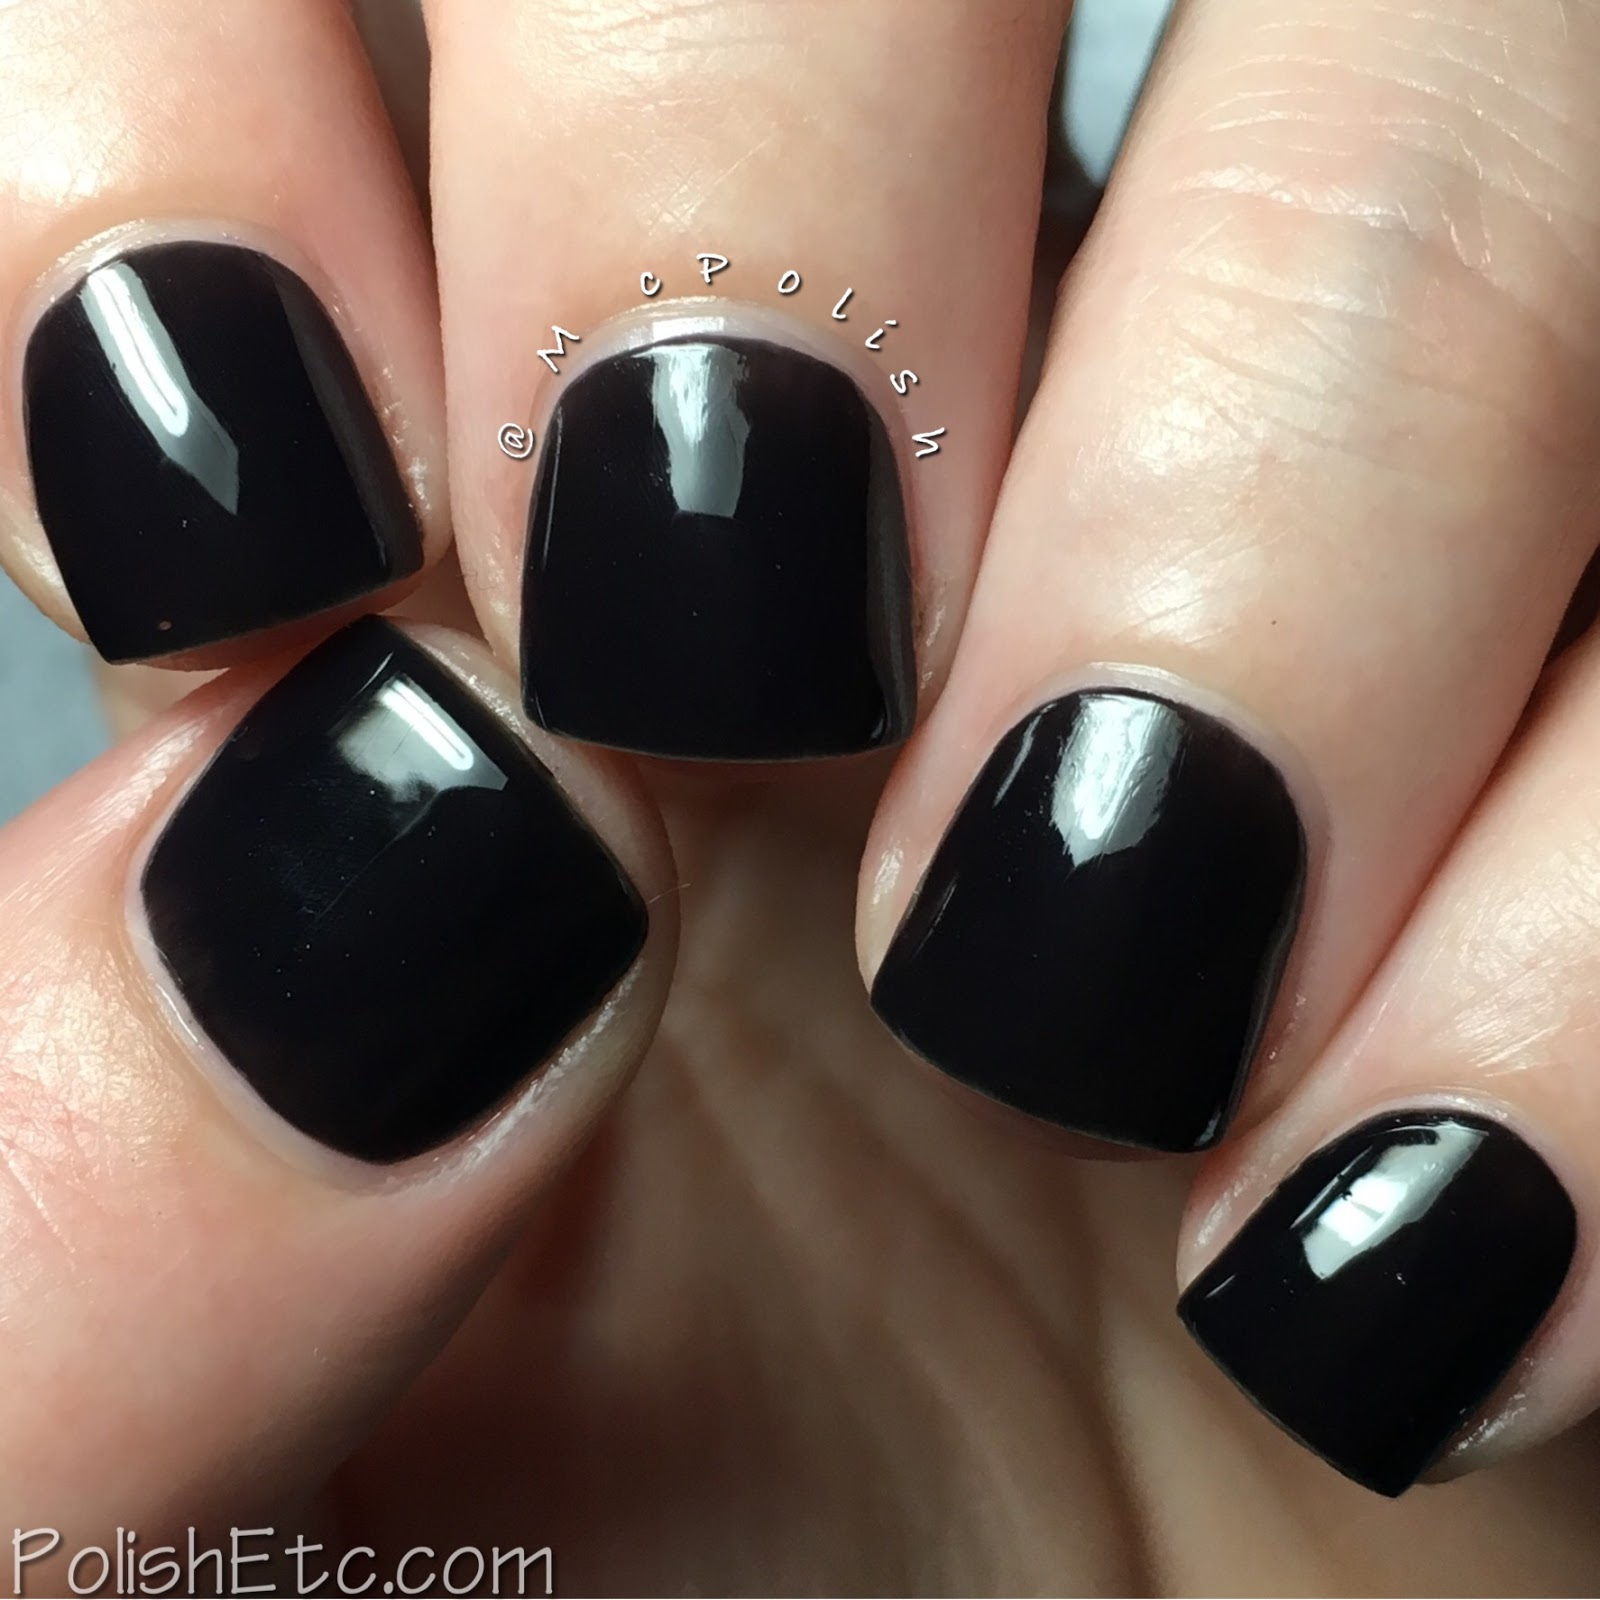 Kiara Sky Nail Lacquer - McPolish - Black to Black